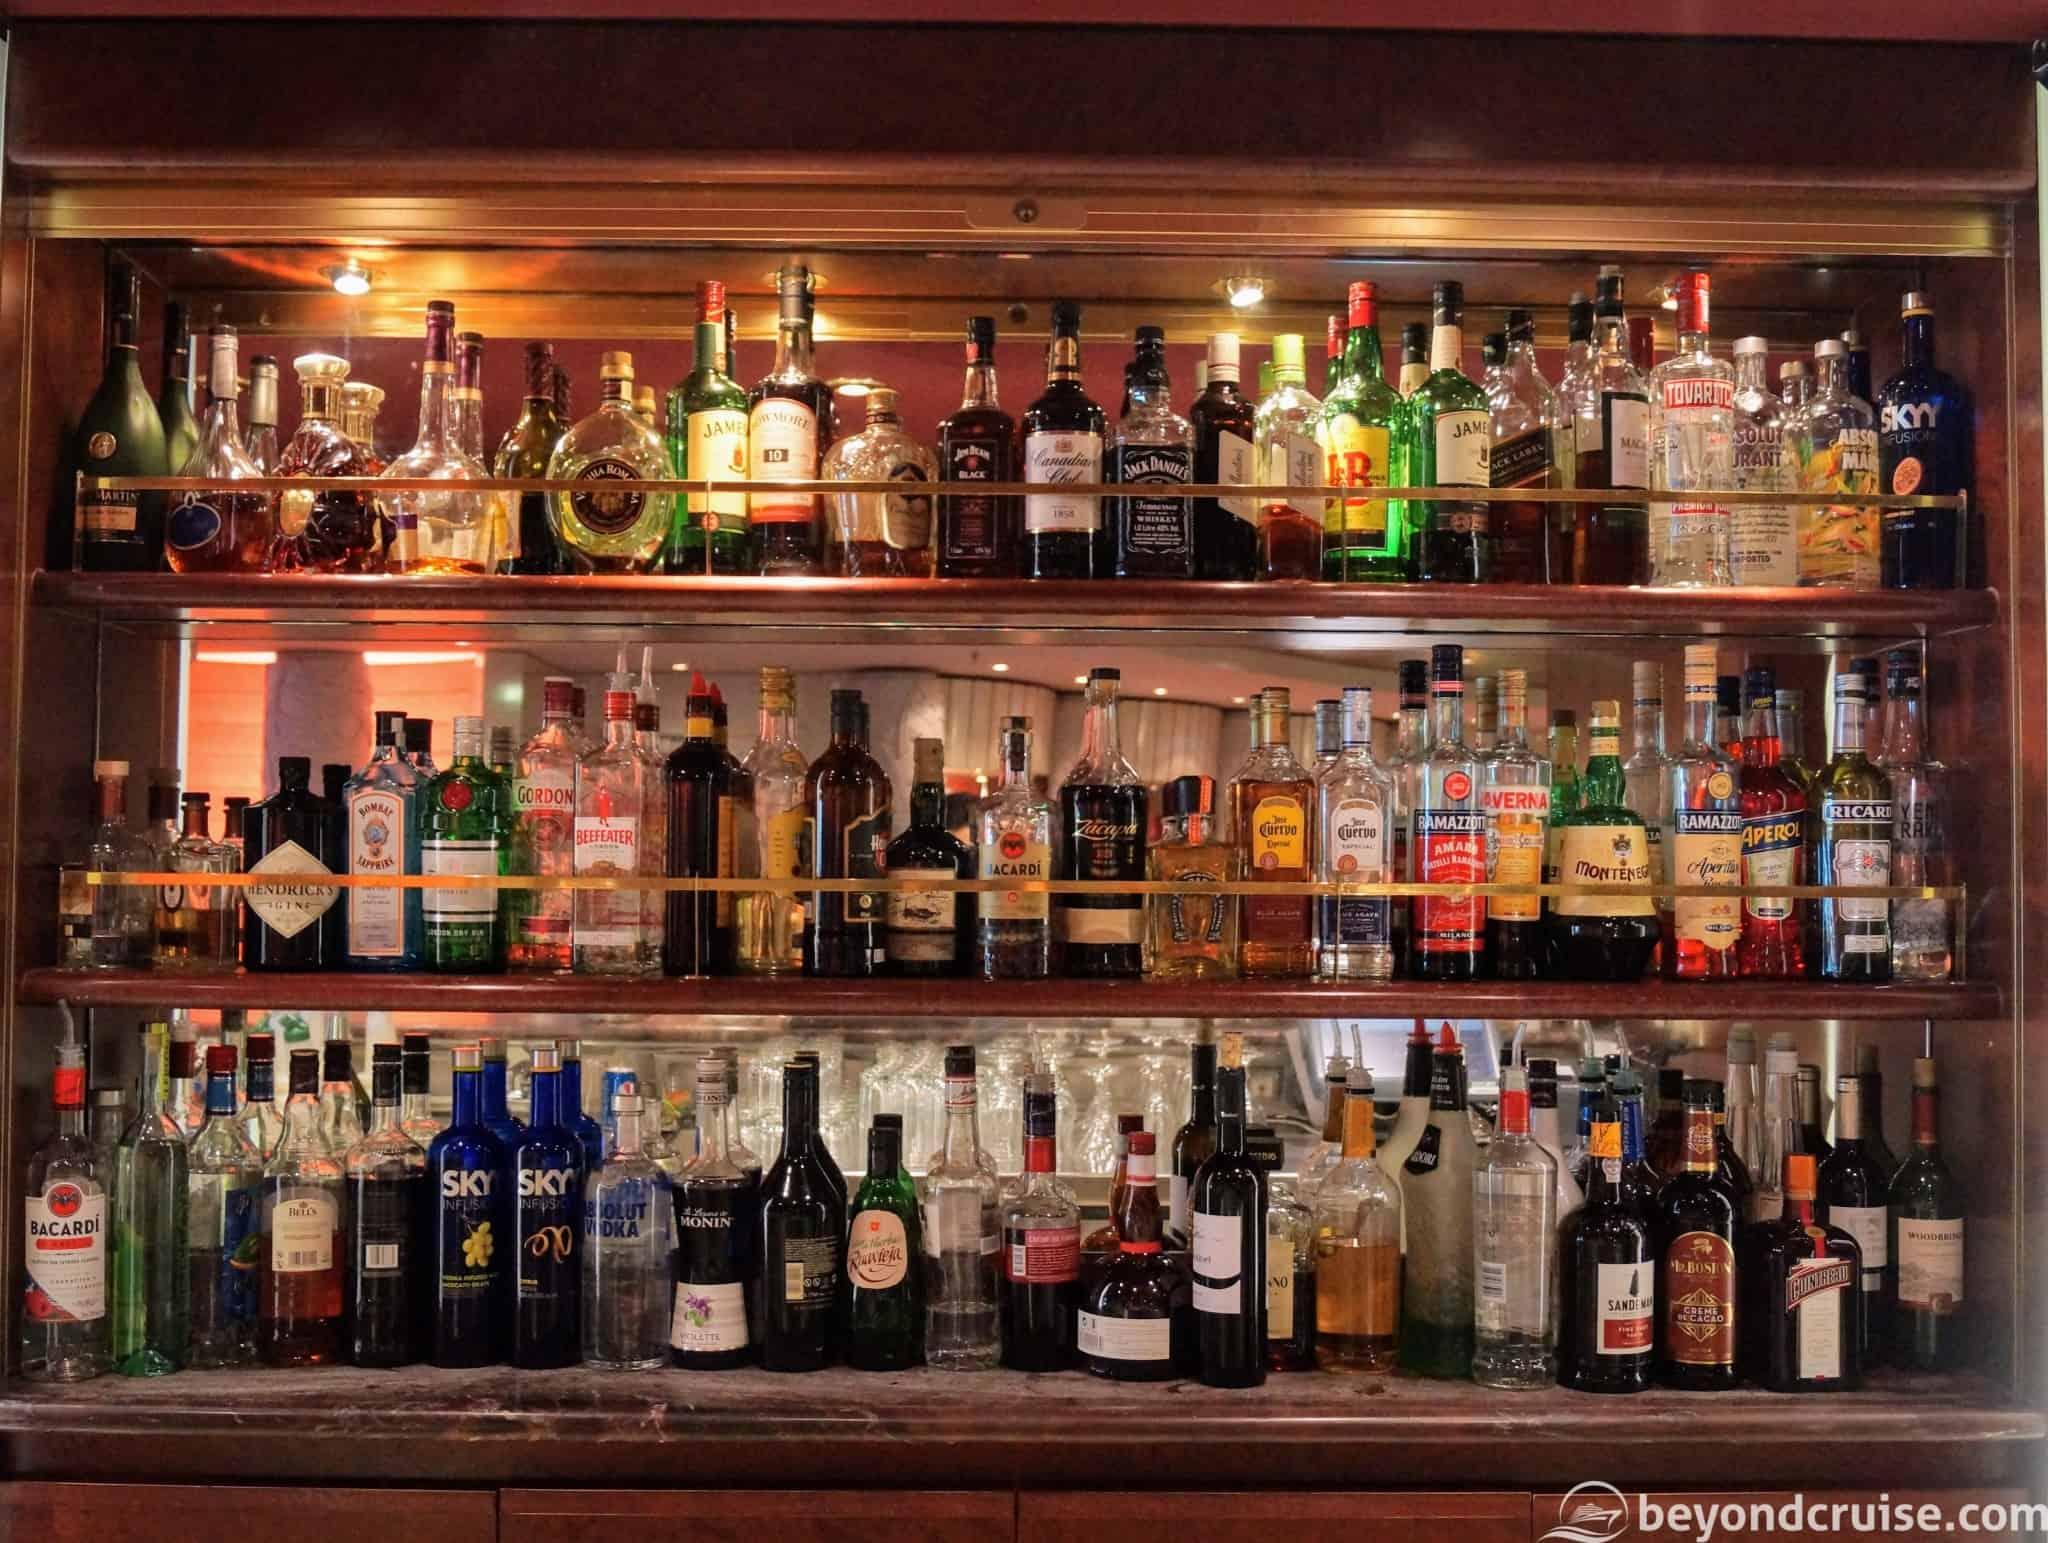 MSC Magnifica Ruby Bar drinks